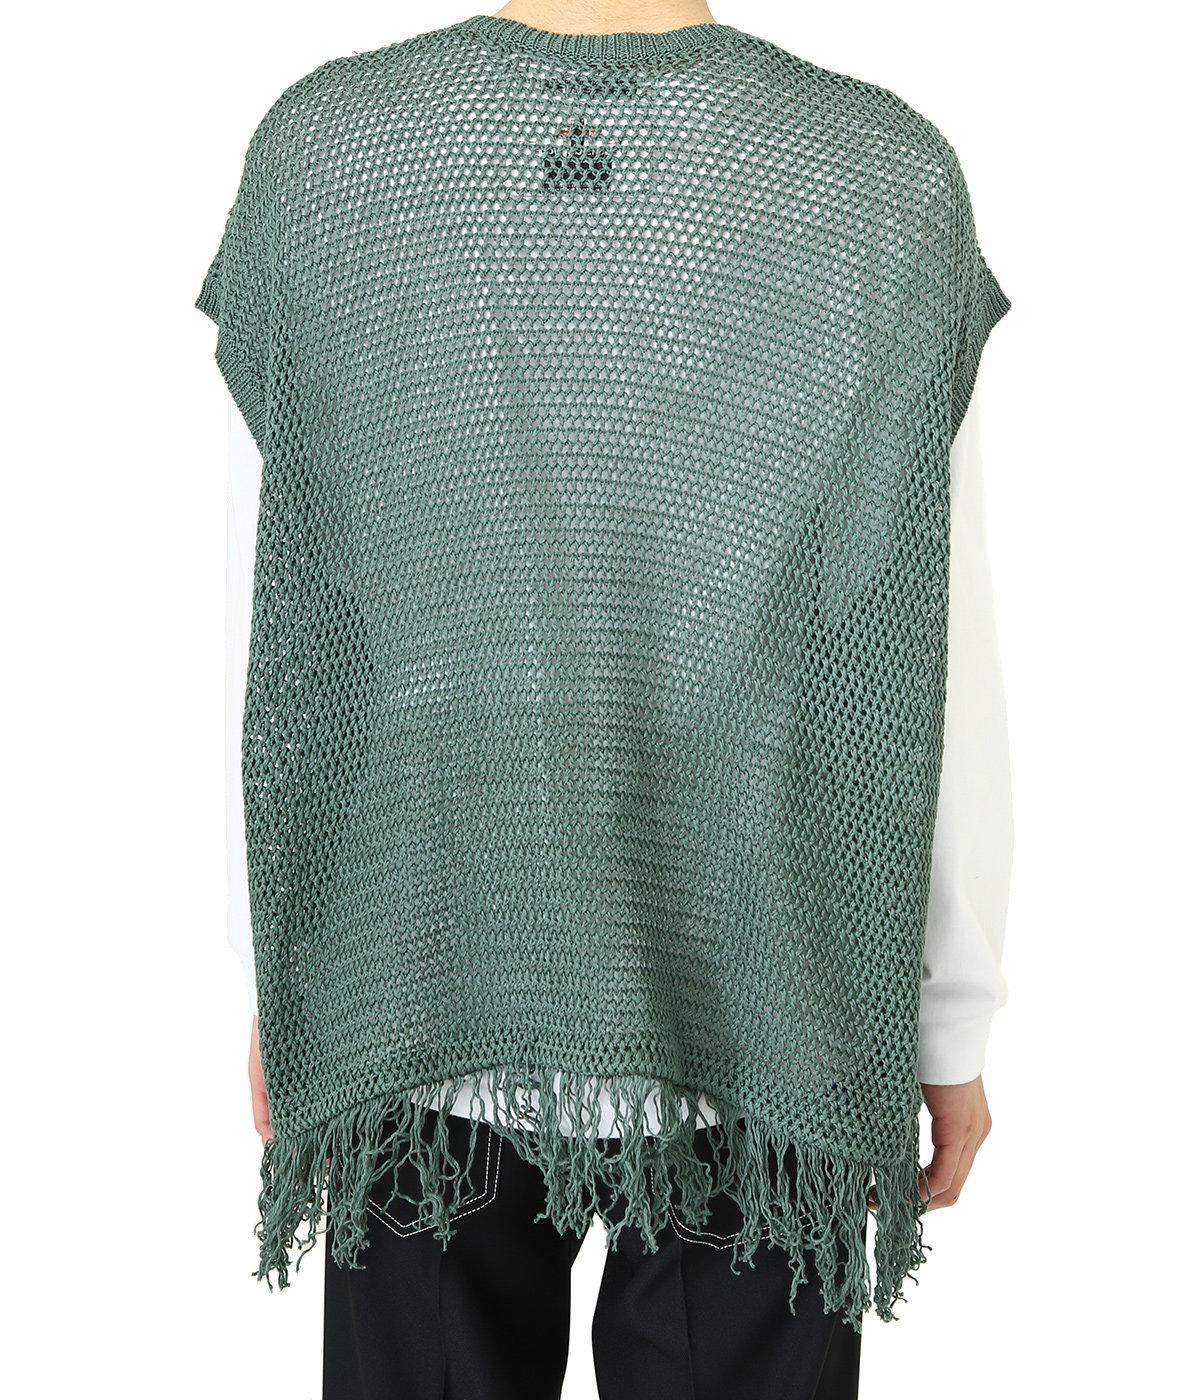 Pullover Fringe Net Knit Vest